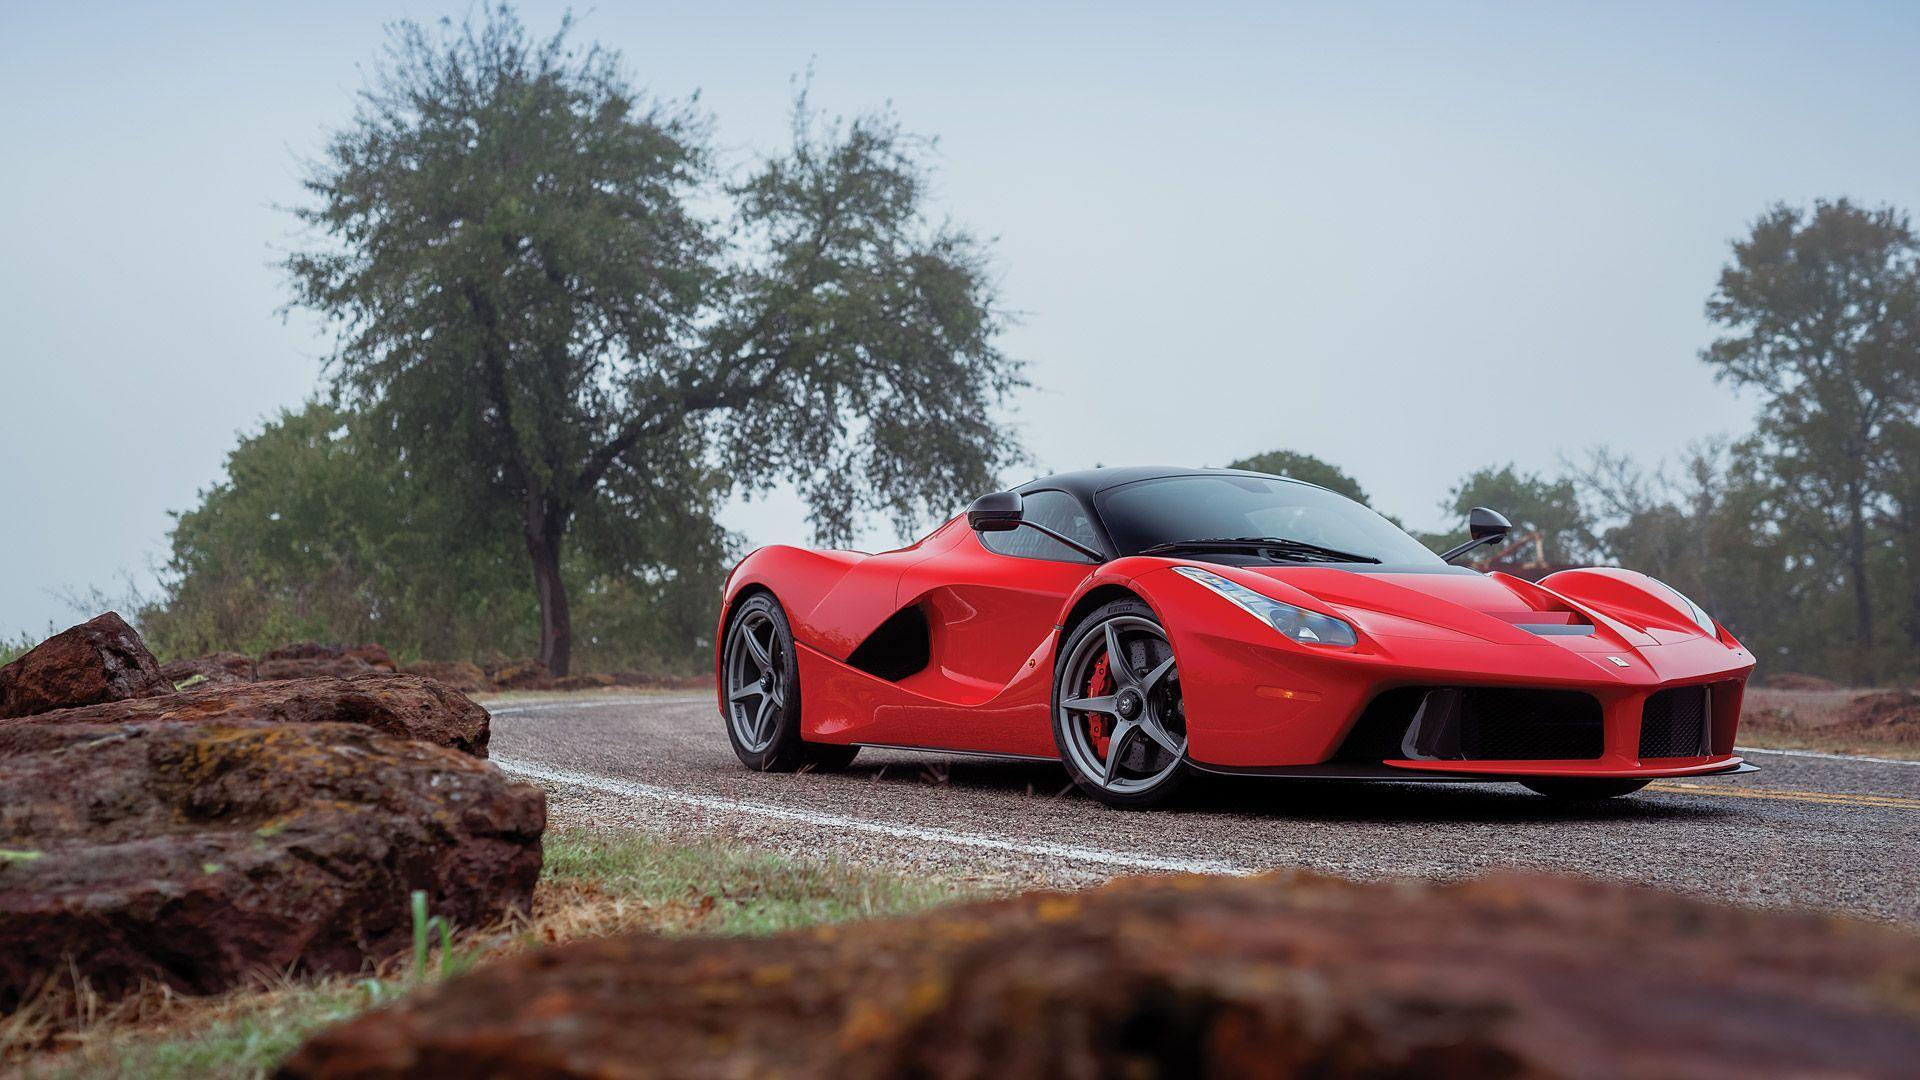 Ferrari laferrari wallpapers top free ferrari laferrari for Immagini full hd 1920x1080